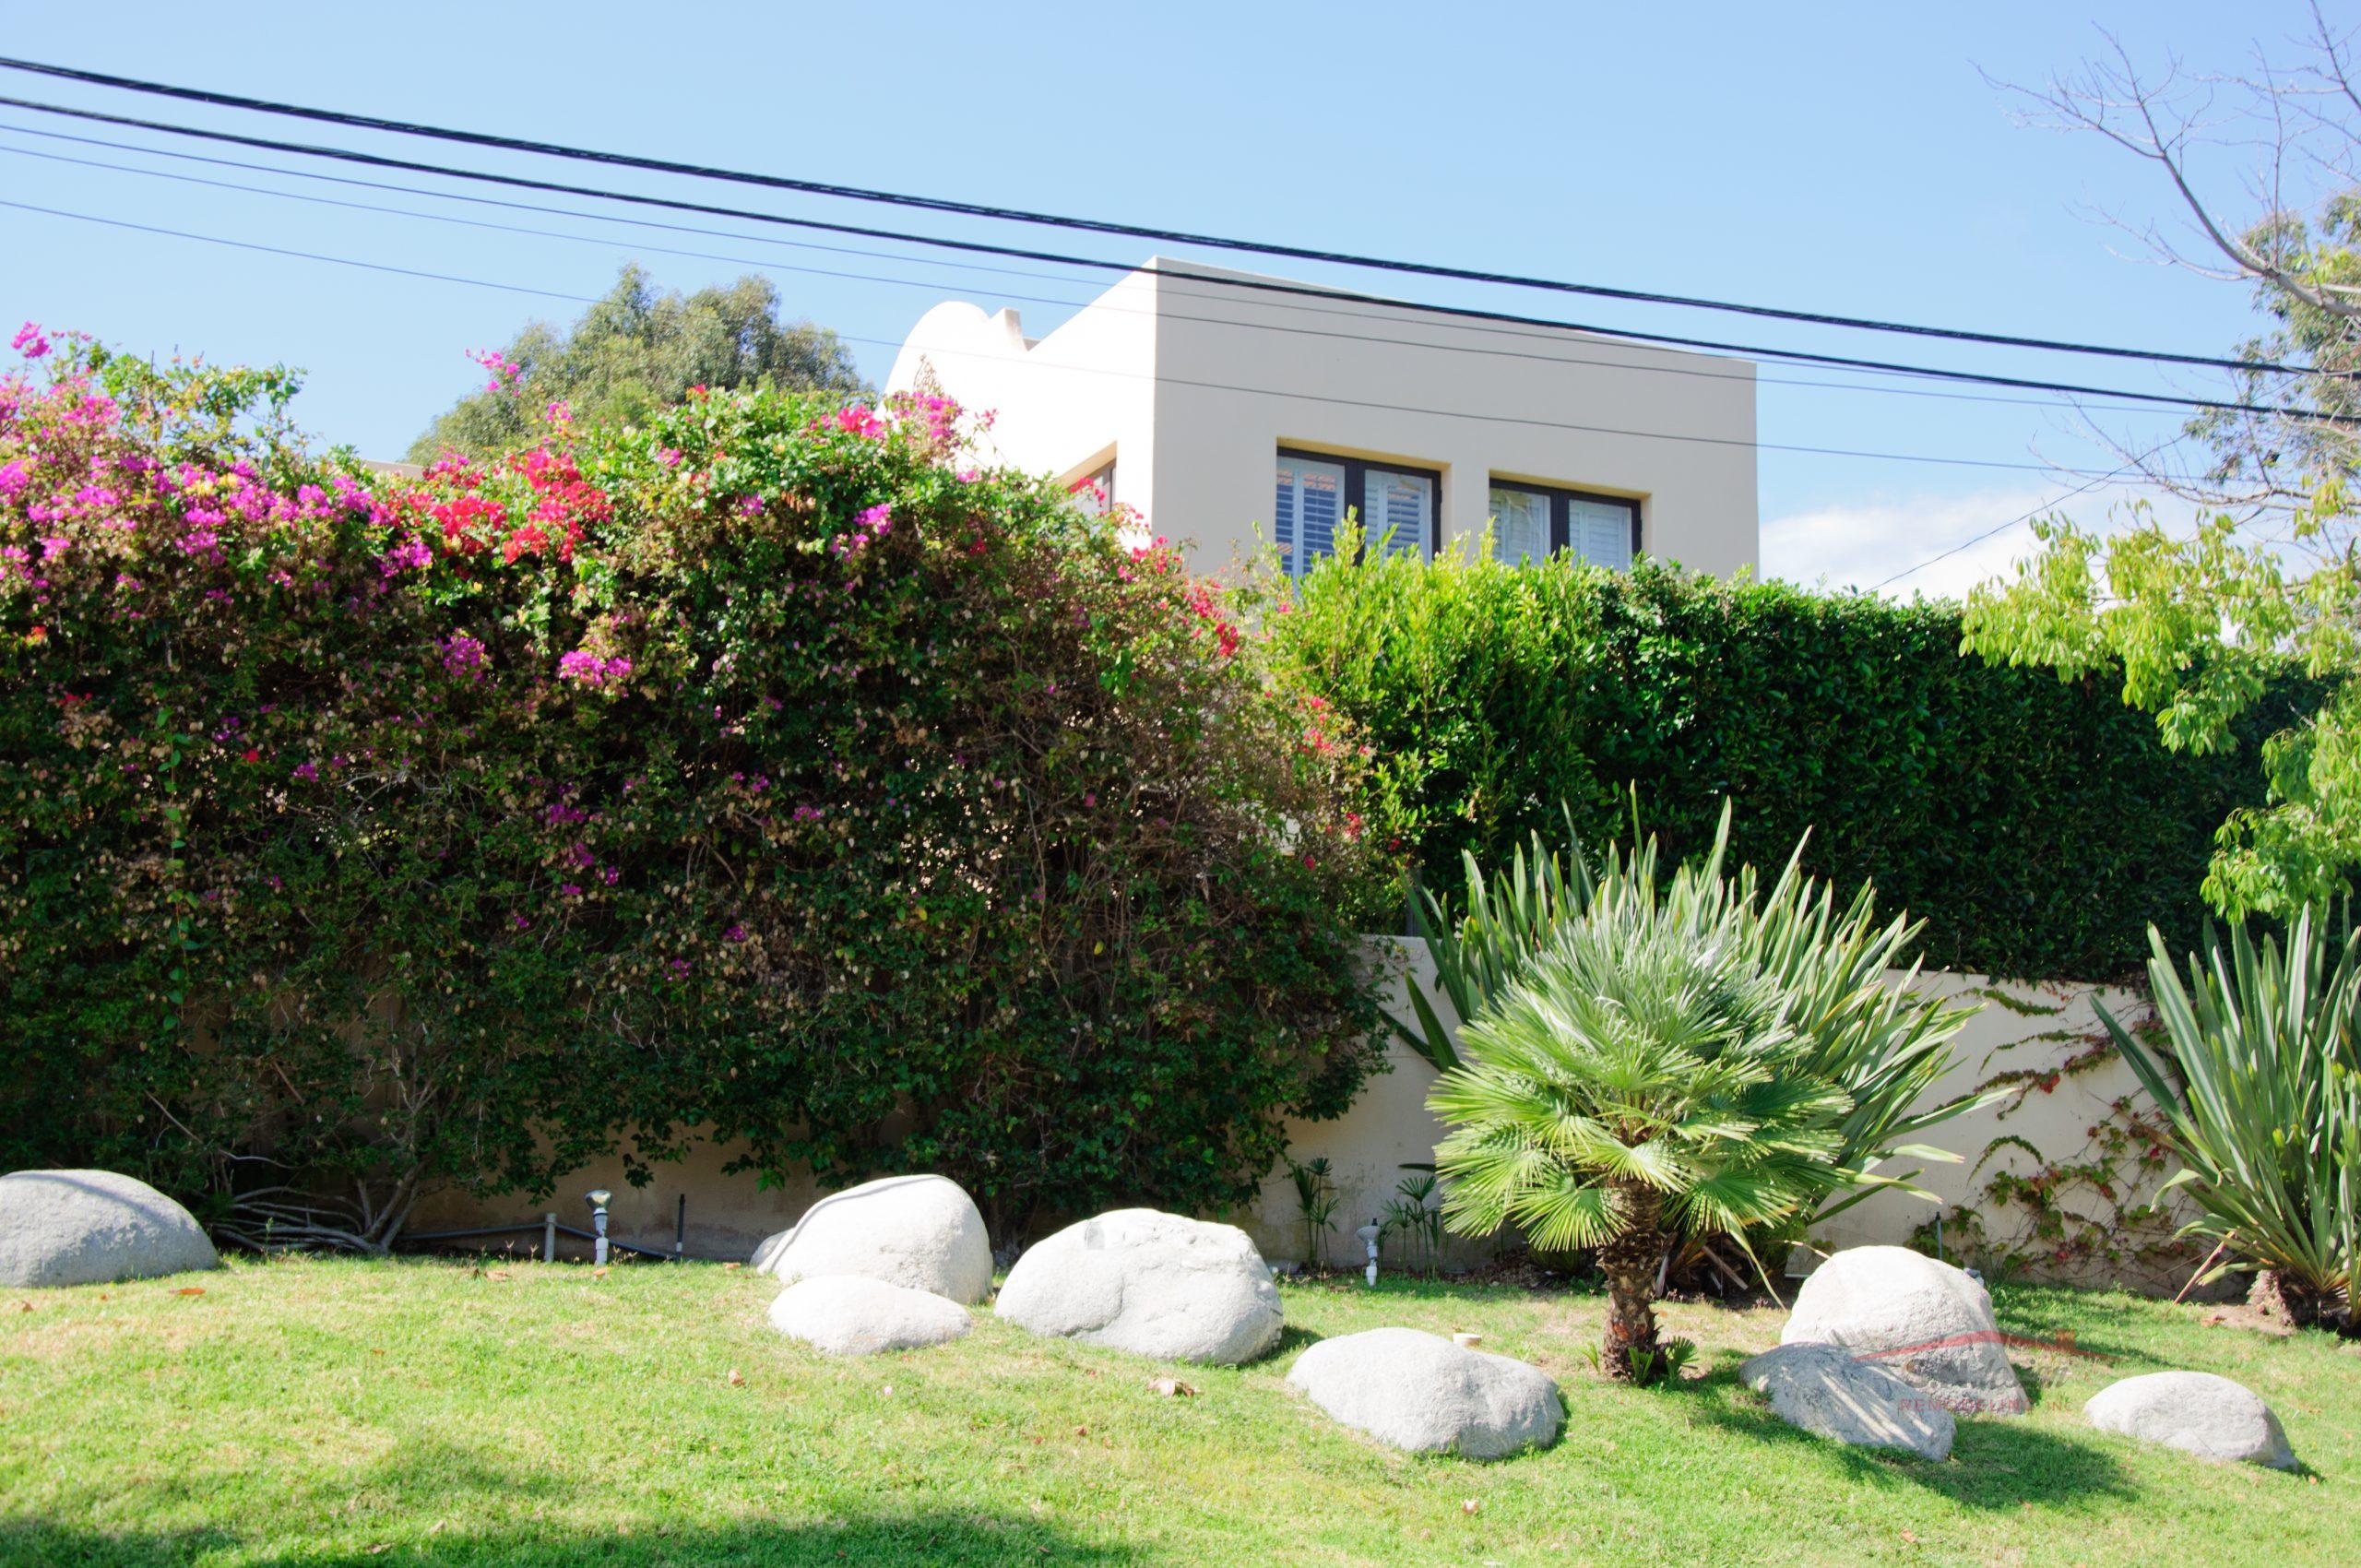 House with green lawn manicured frontyard garden in suburban residential neighborhood